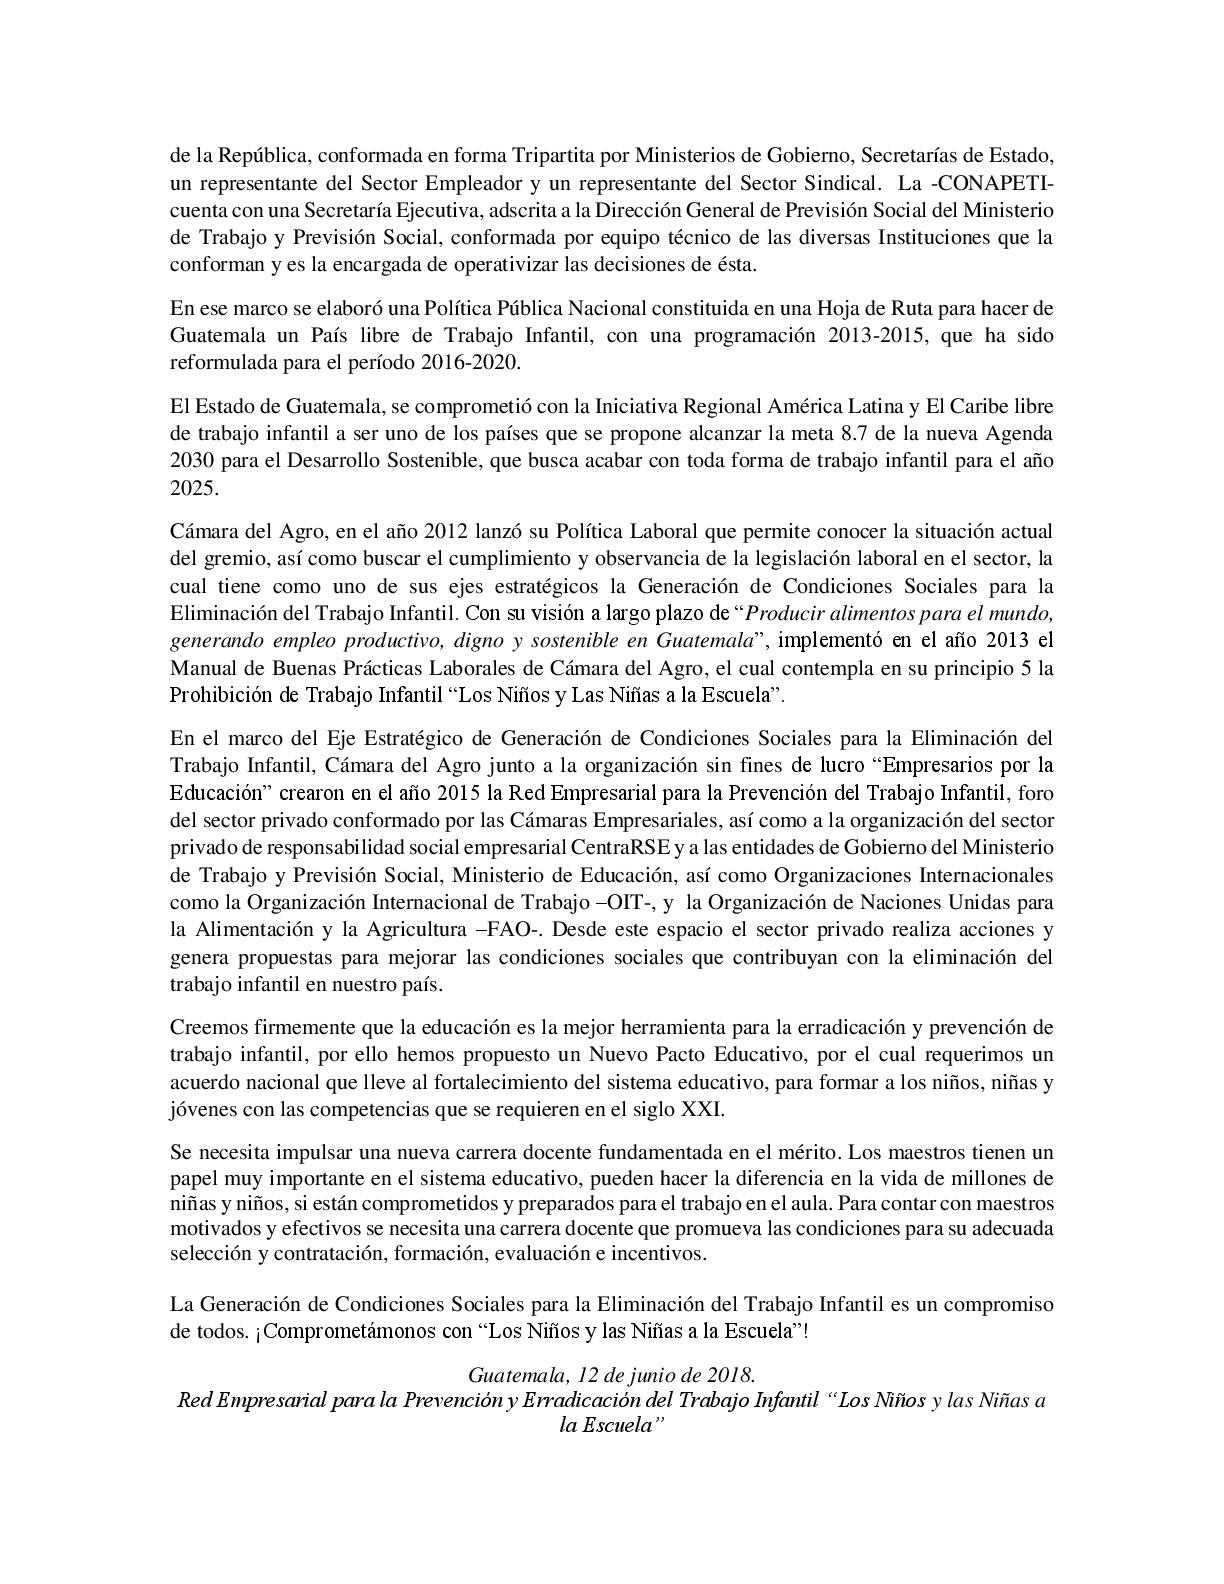 Di_a_Mundial_Contra_el_Trabajo_Infantil_2018_CAMAGRO-002.jpg